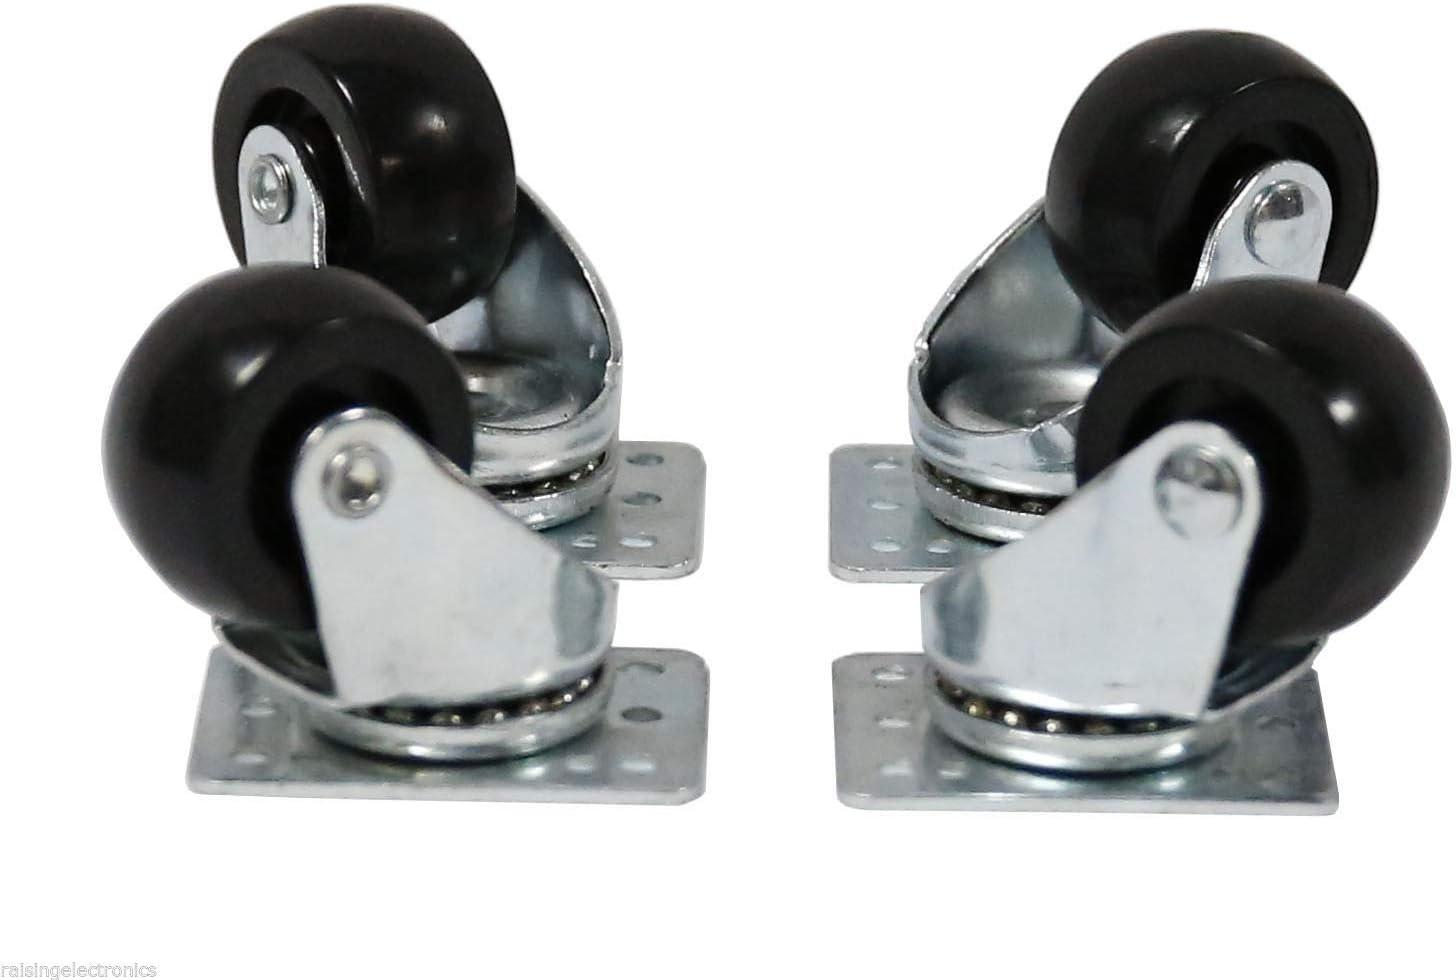 RAISING ELECTRONICS 4 Pieces Server Cabinet Casters Wheels Racks Heavy Duty